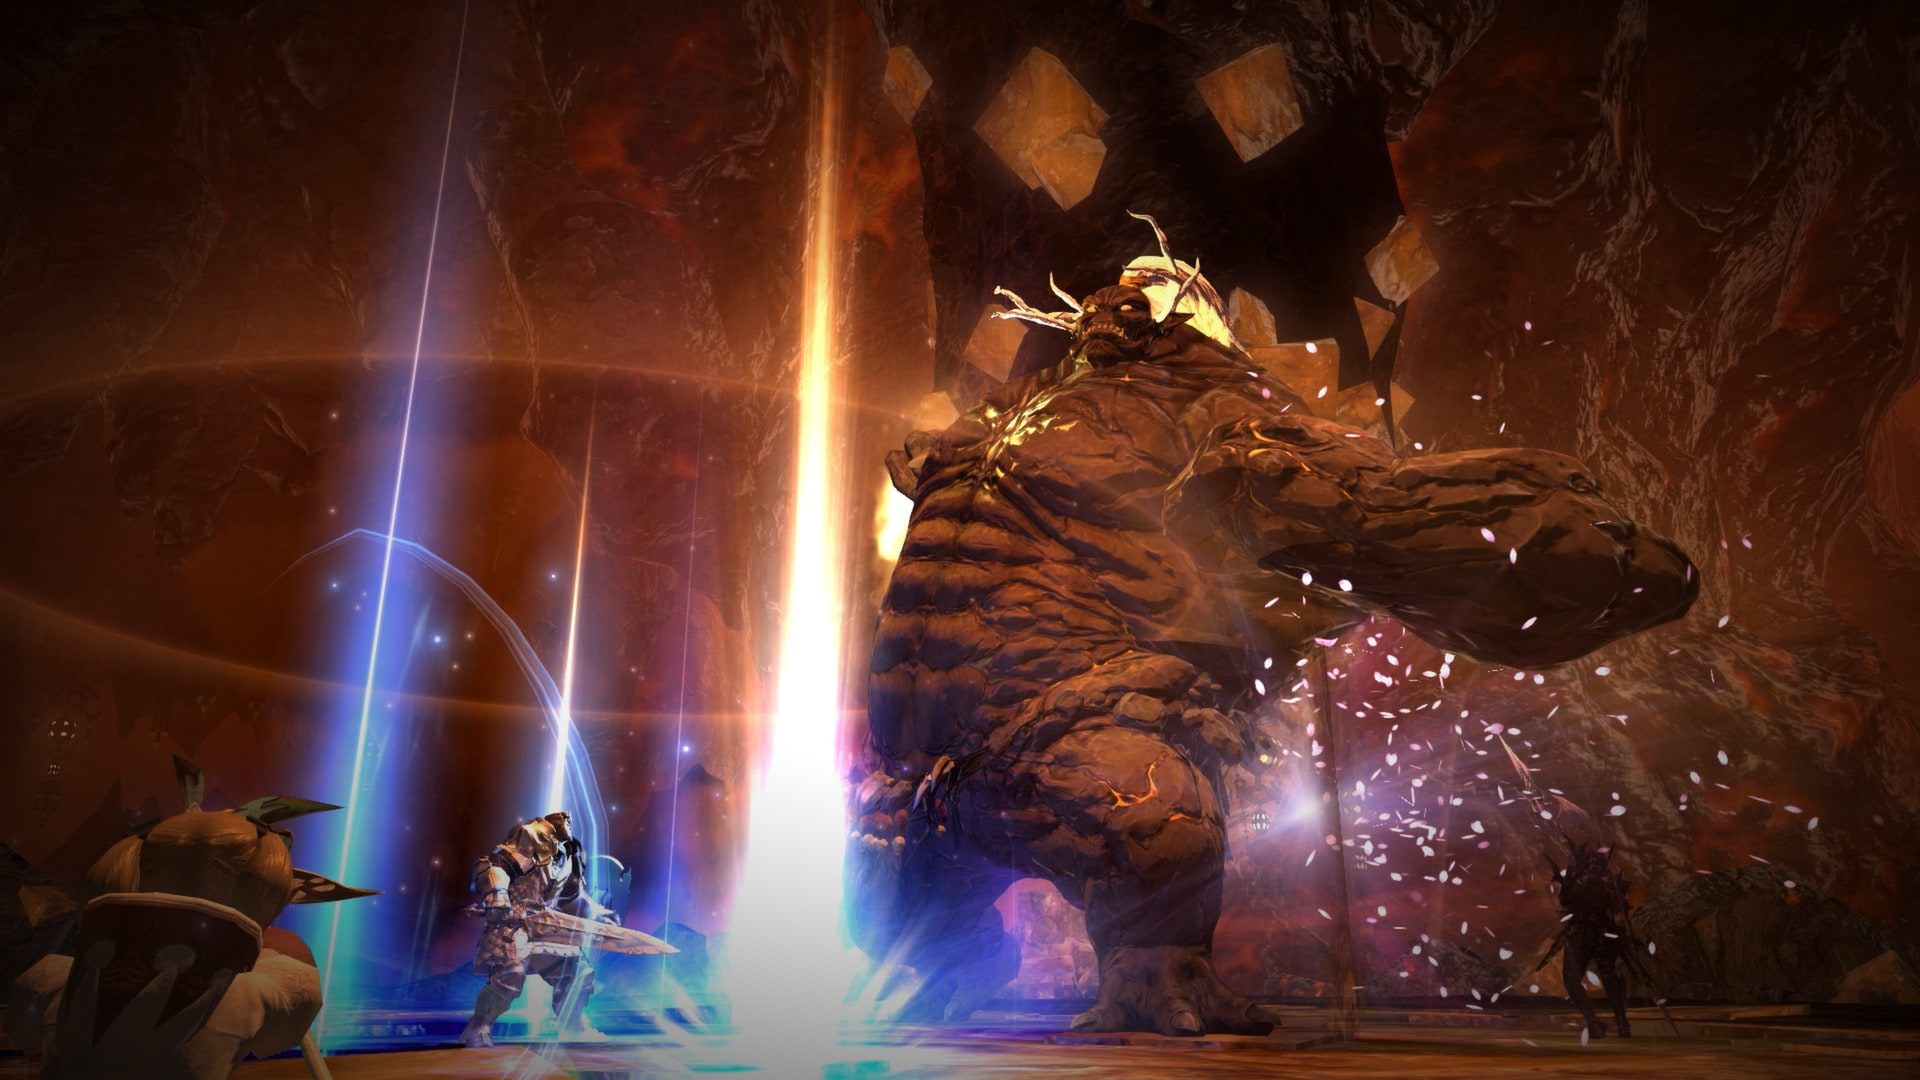 Final Fantasy XIV: A Realm Reborn + 30 Days Included Final Fantasy EUROPE - 4